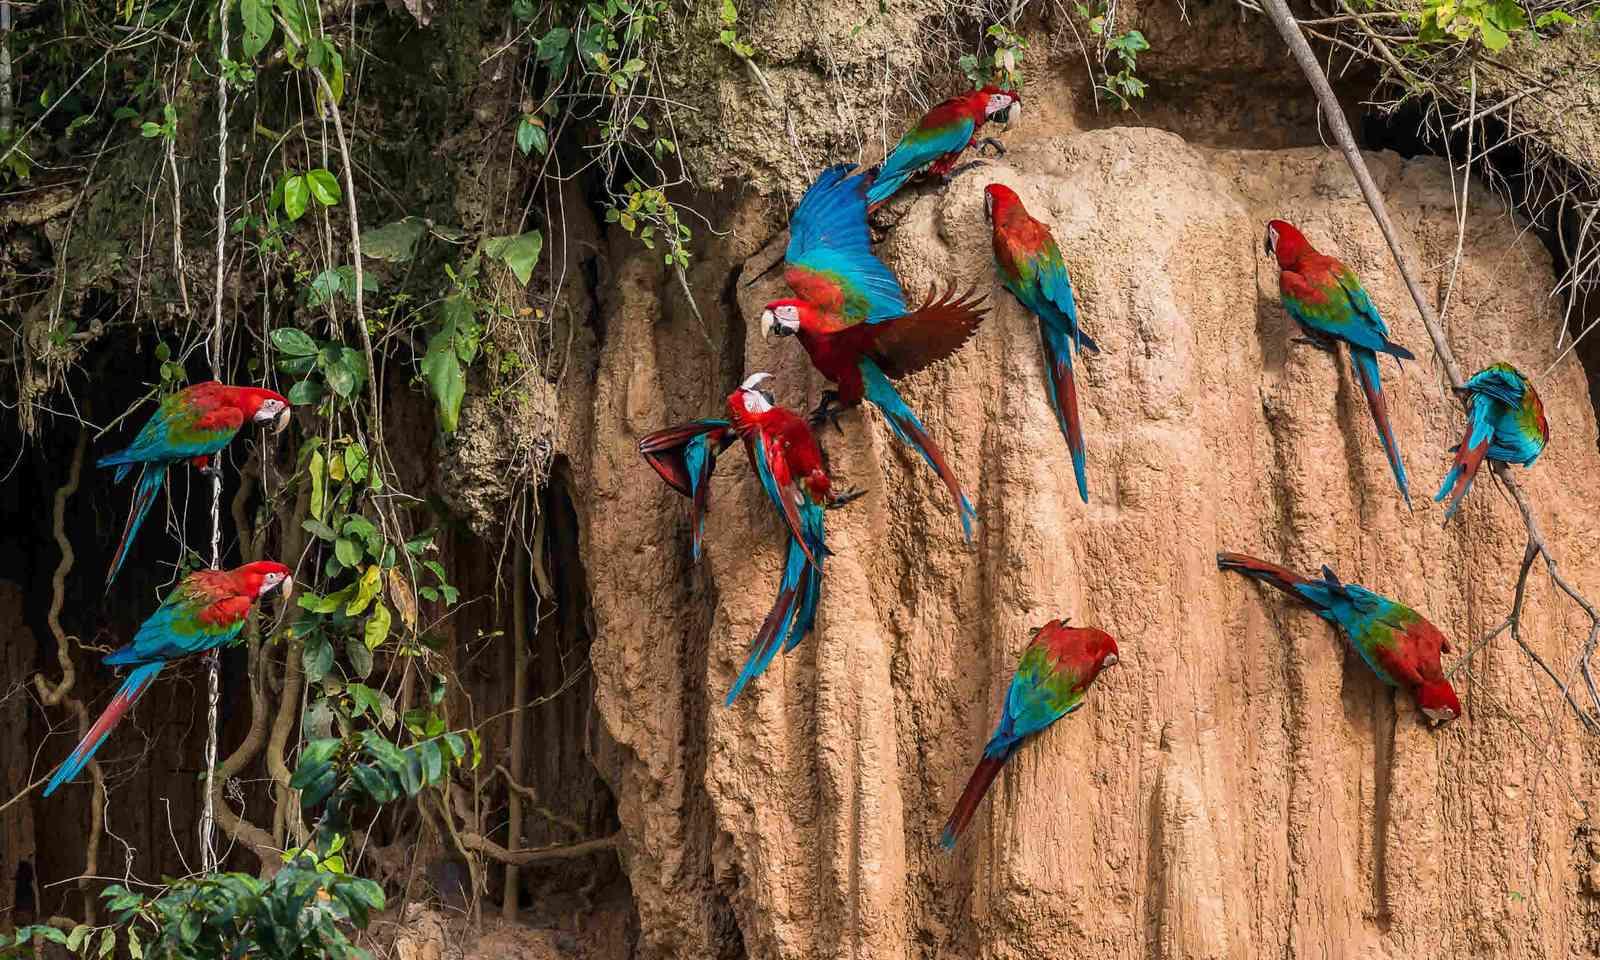 Macaws in clay lick in the peruvian Amazon jungle (Shutterstock)